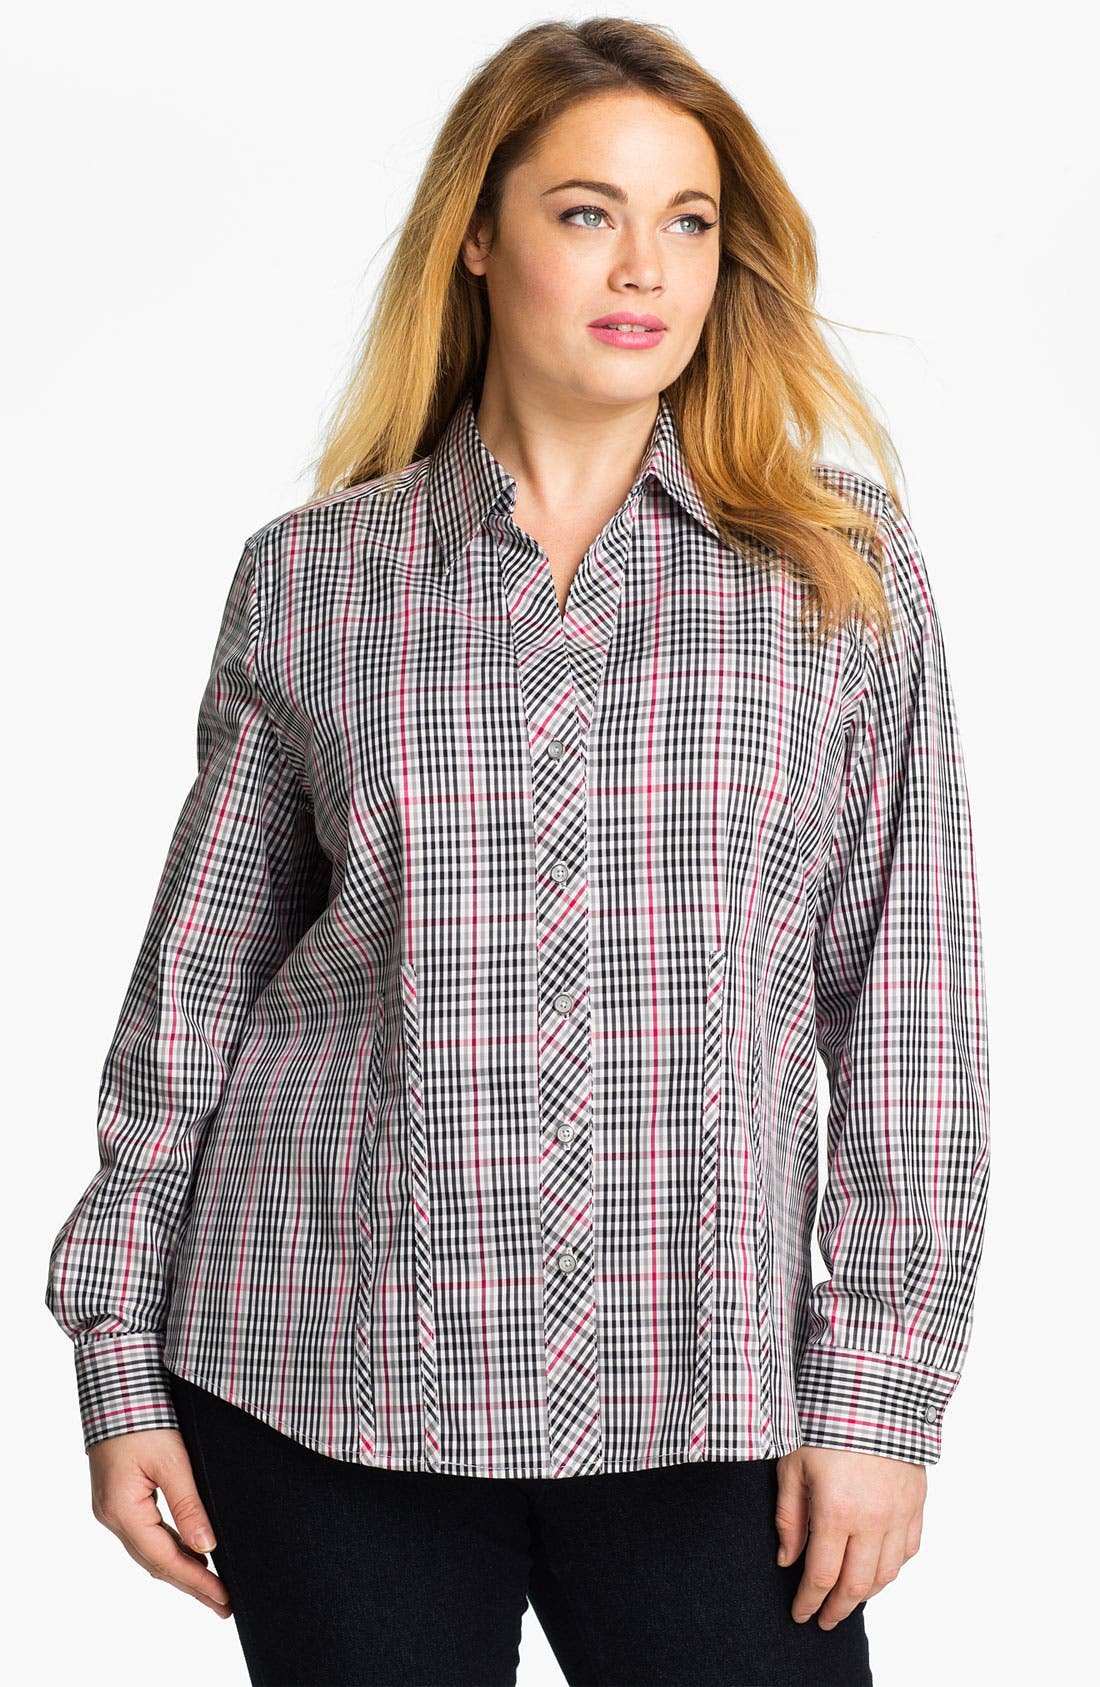 Main Image - Foxcroft 'Holiday Check' Wrinkle Free Shaped Shirt (Plus)